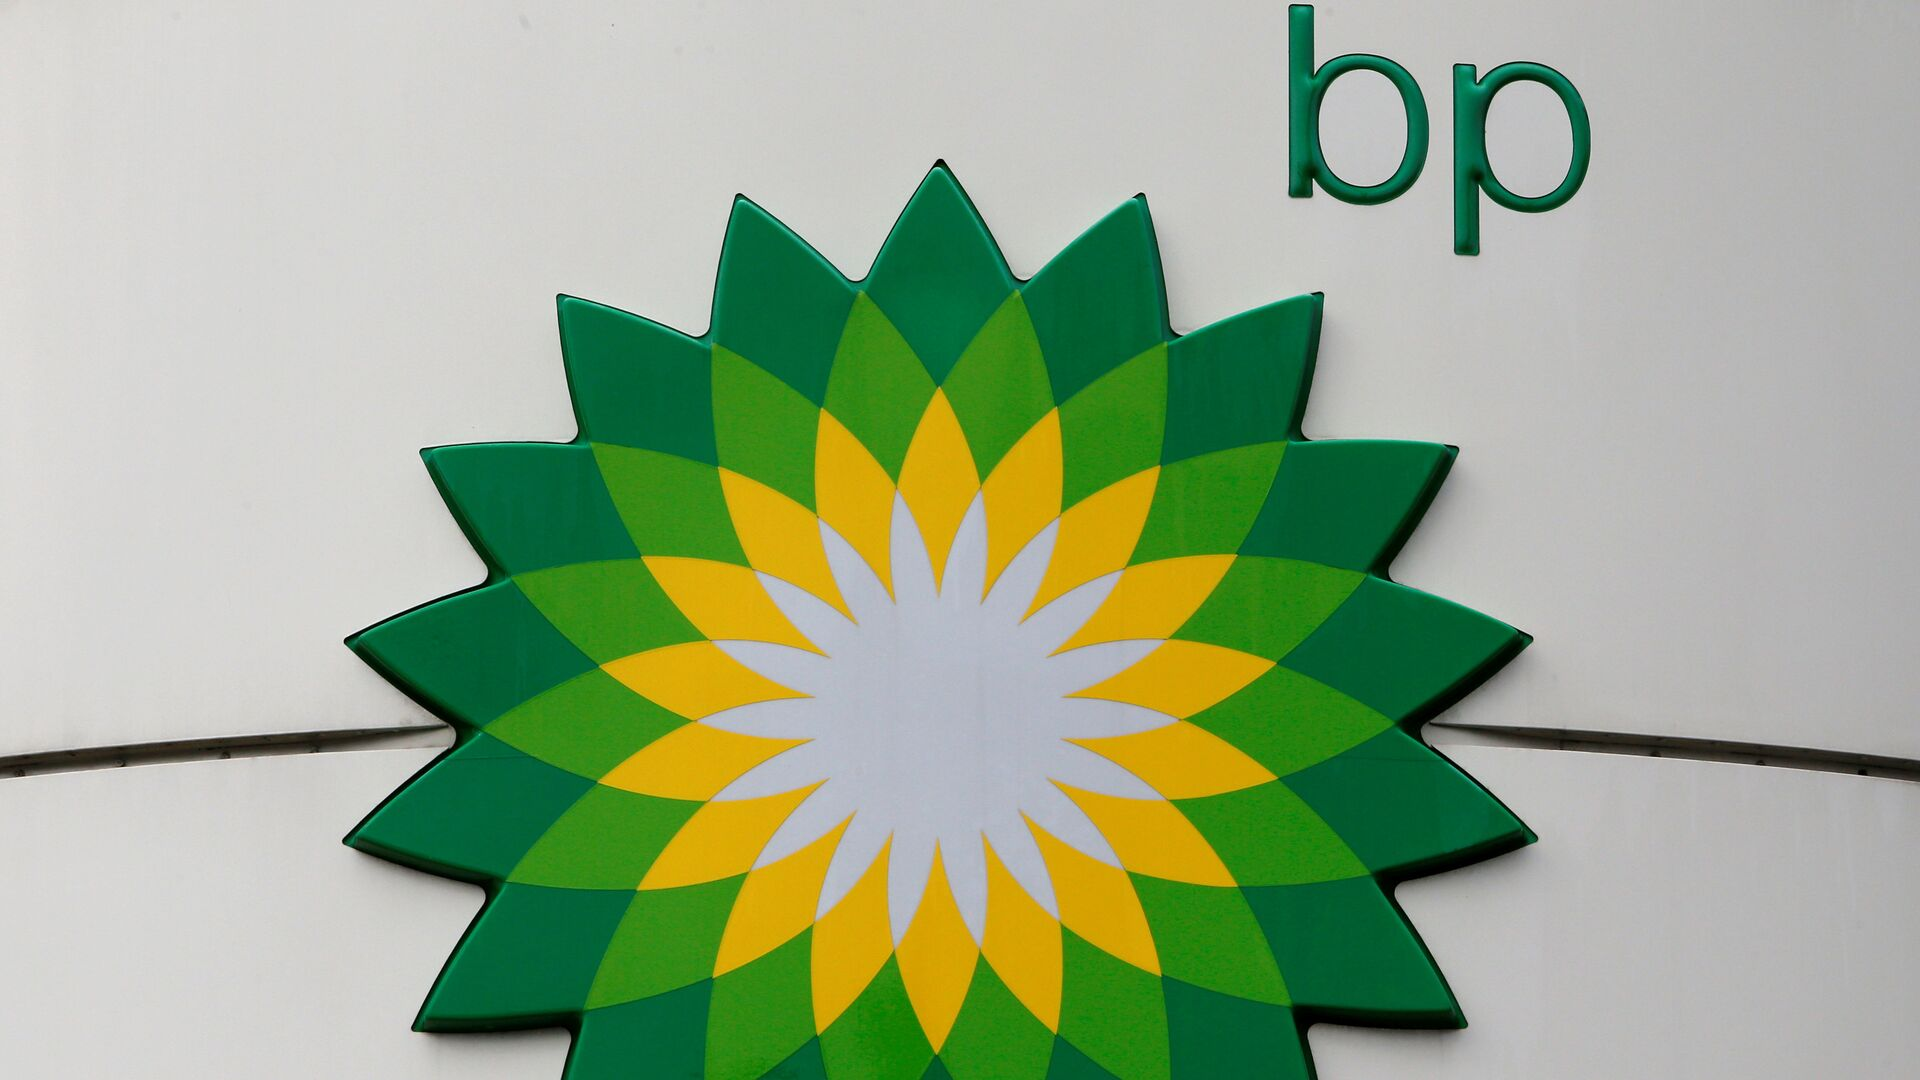 El logo de la compañía petrolera BP - Sputnik Mundo, 1920, 13.04.2021